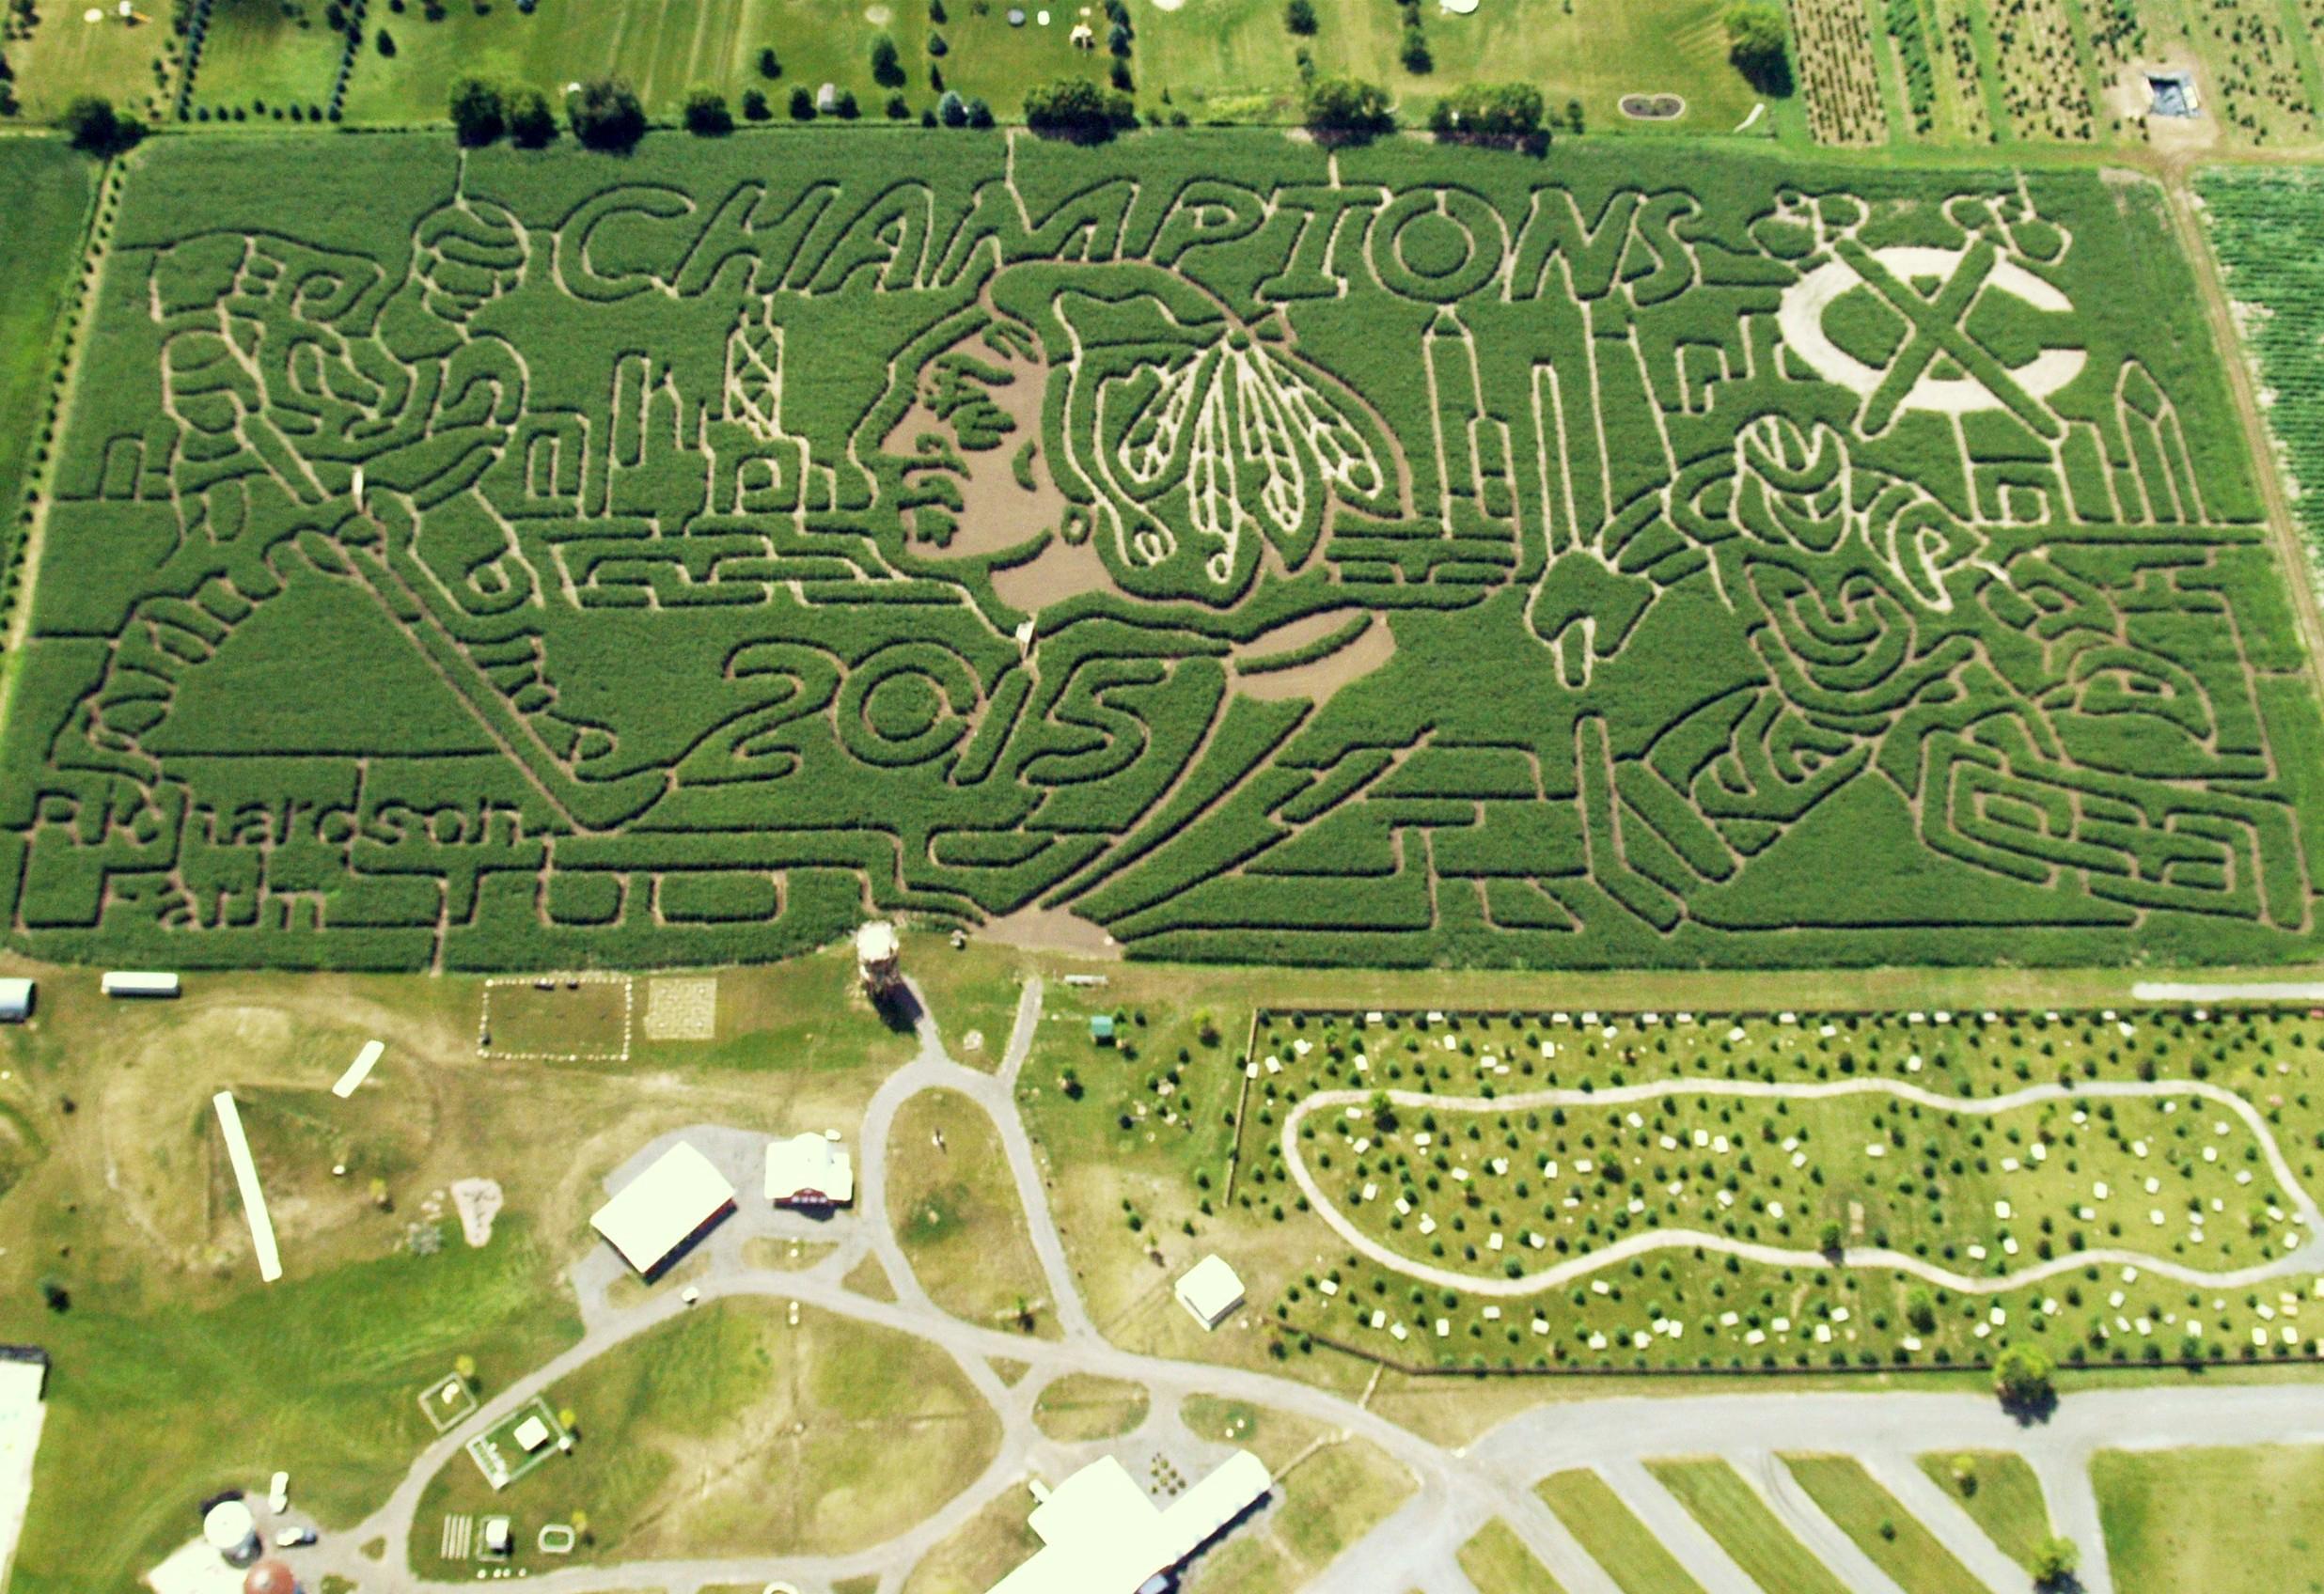 Corn maze at Richardson Adventure Farm near Chicago